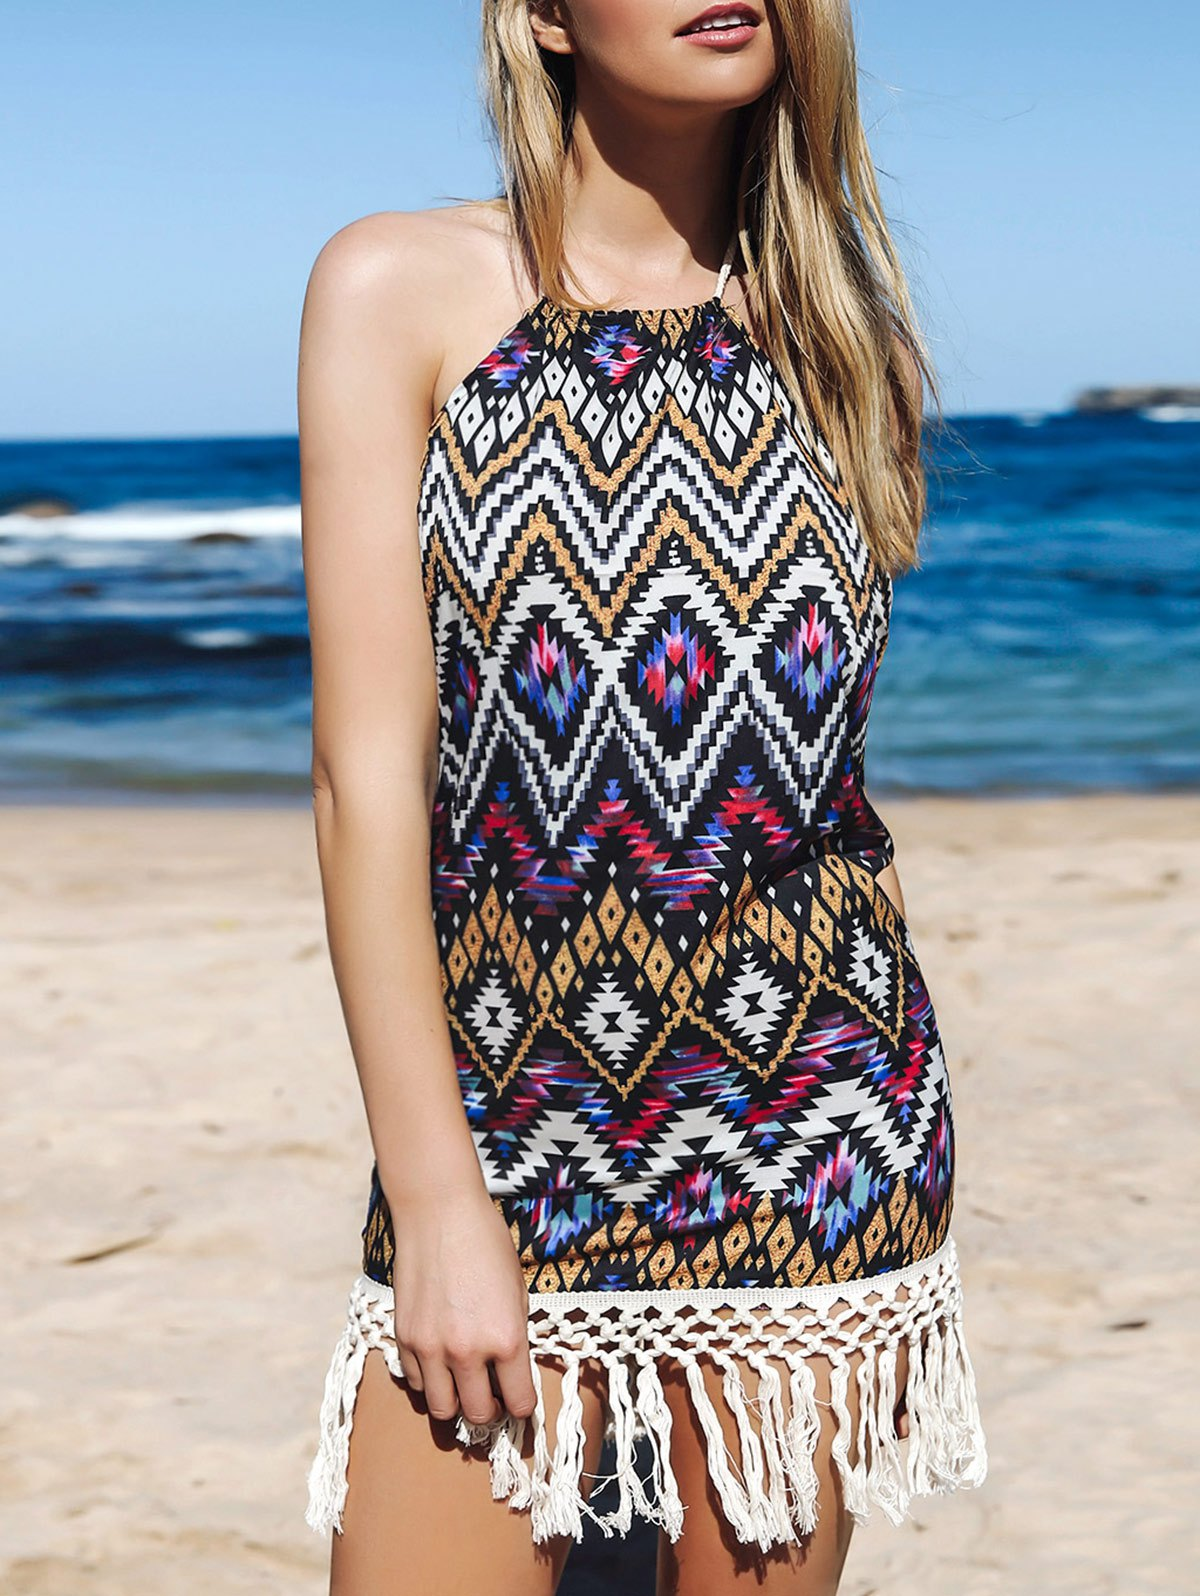 Halter Sleeeveless Backless Fringe Geometric Print Dress